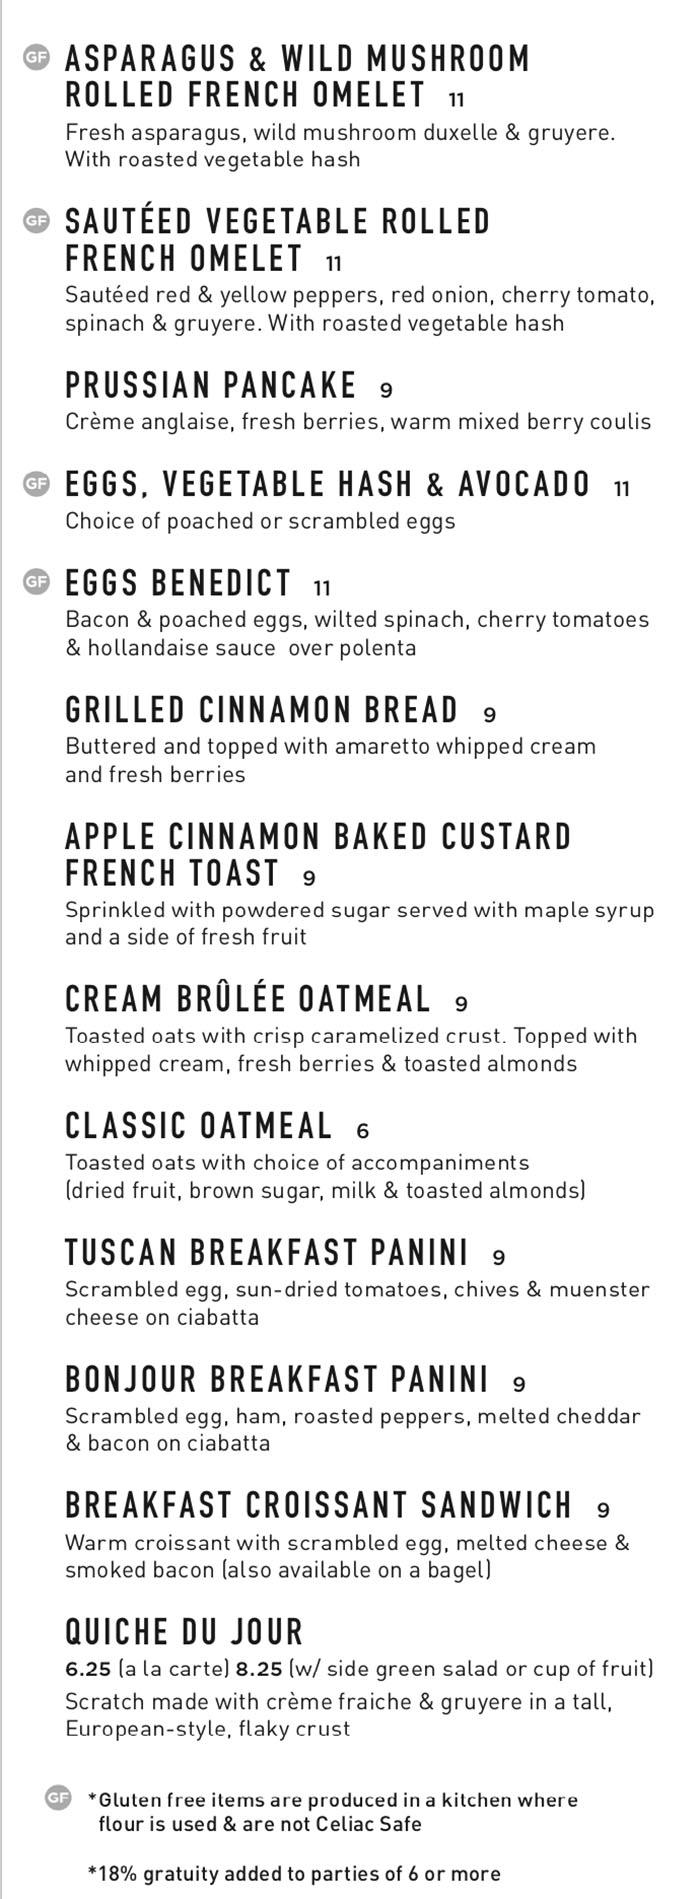 Gourmandise breakfast menu - savory